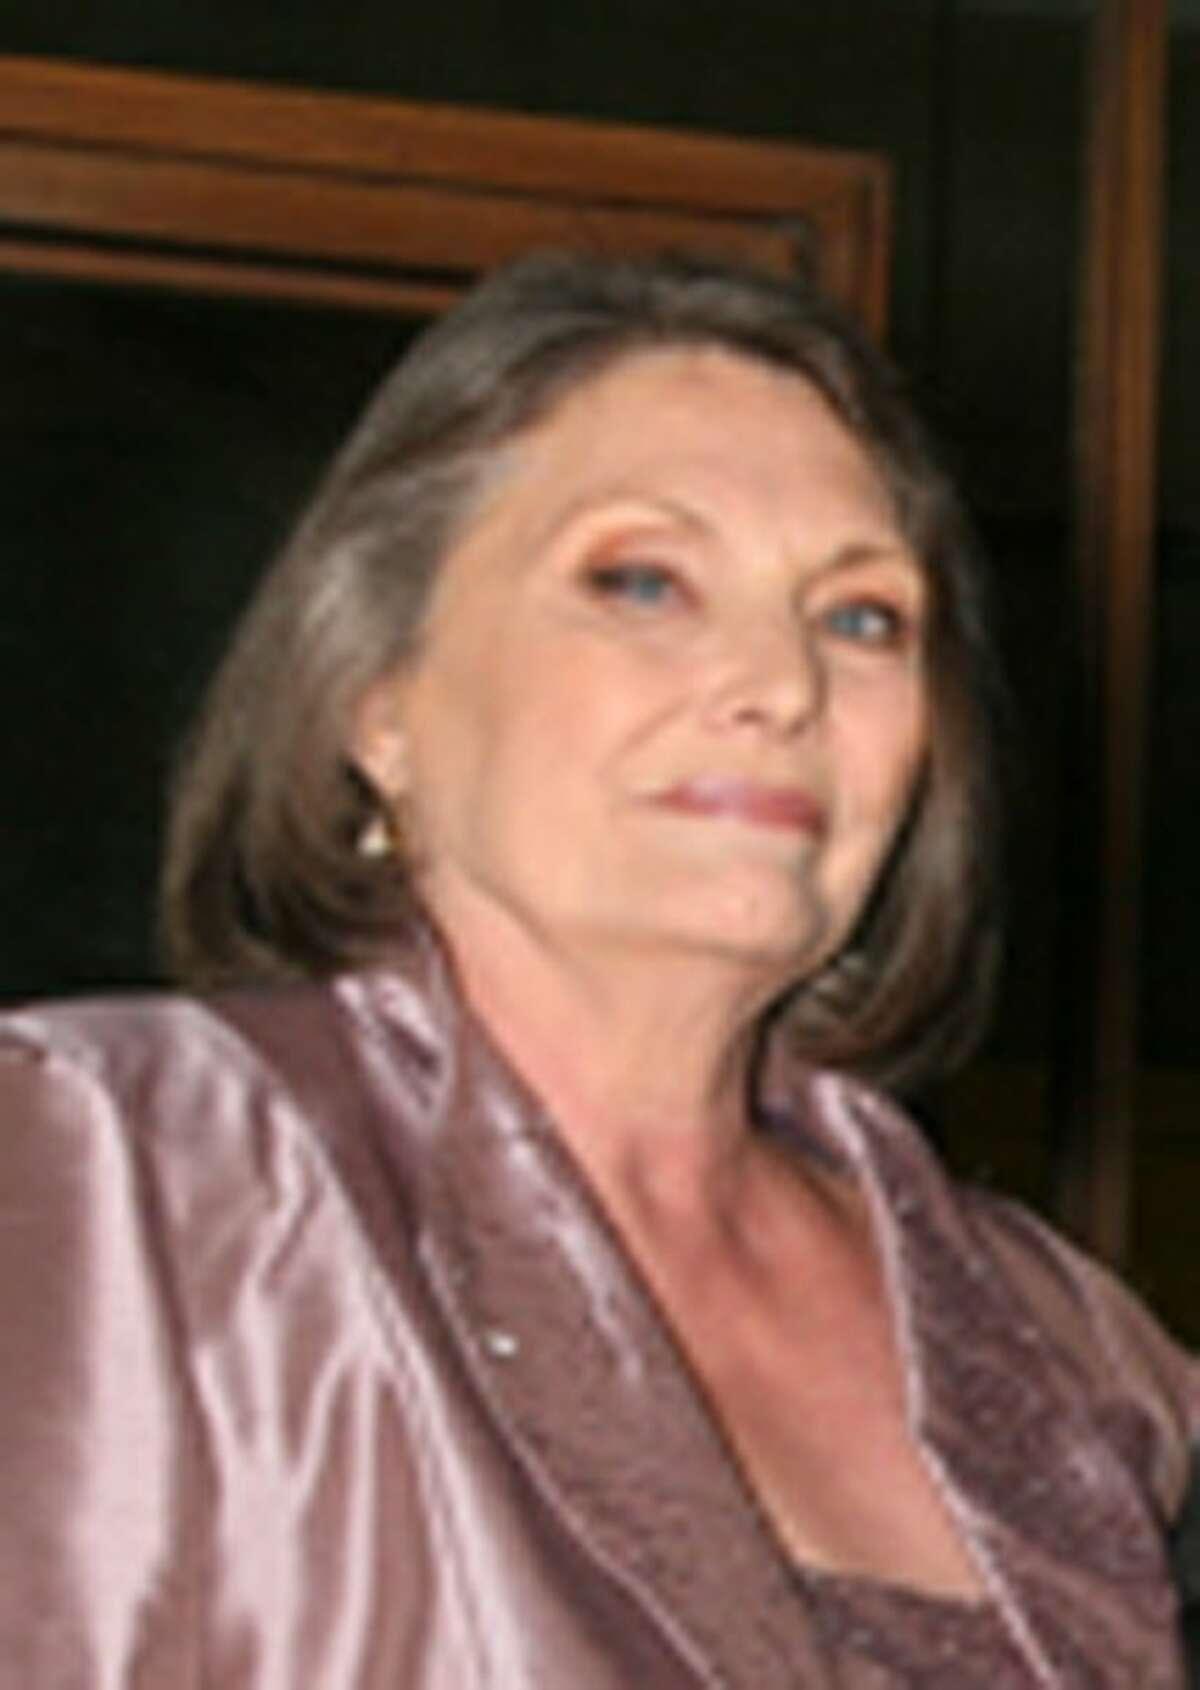 PAMELA LYN BADOVINAC